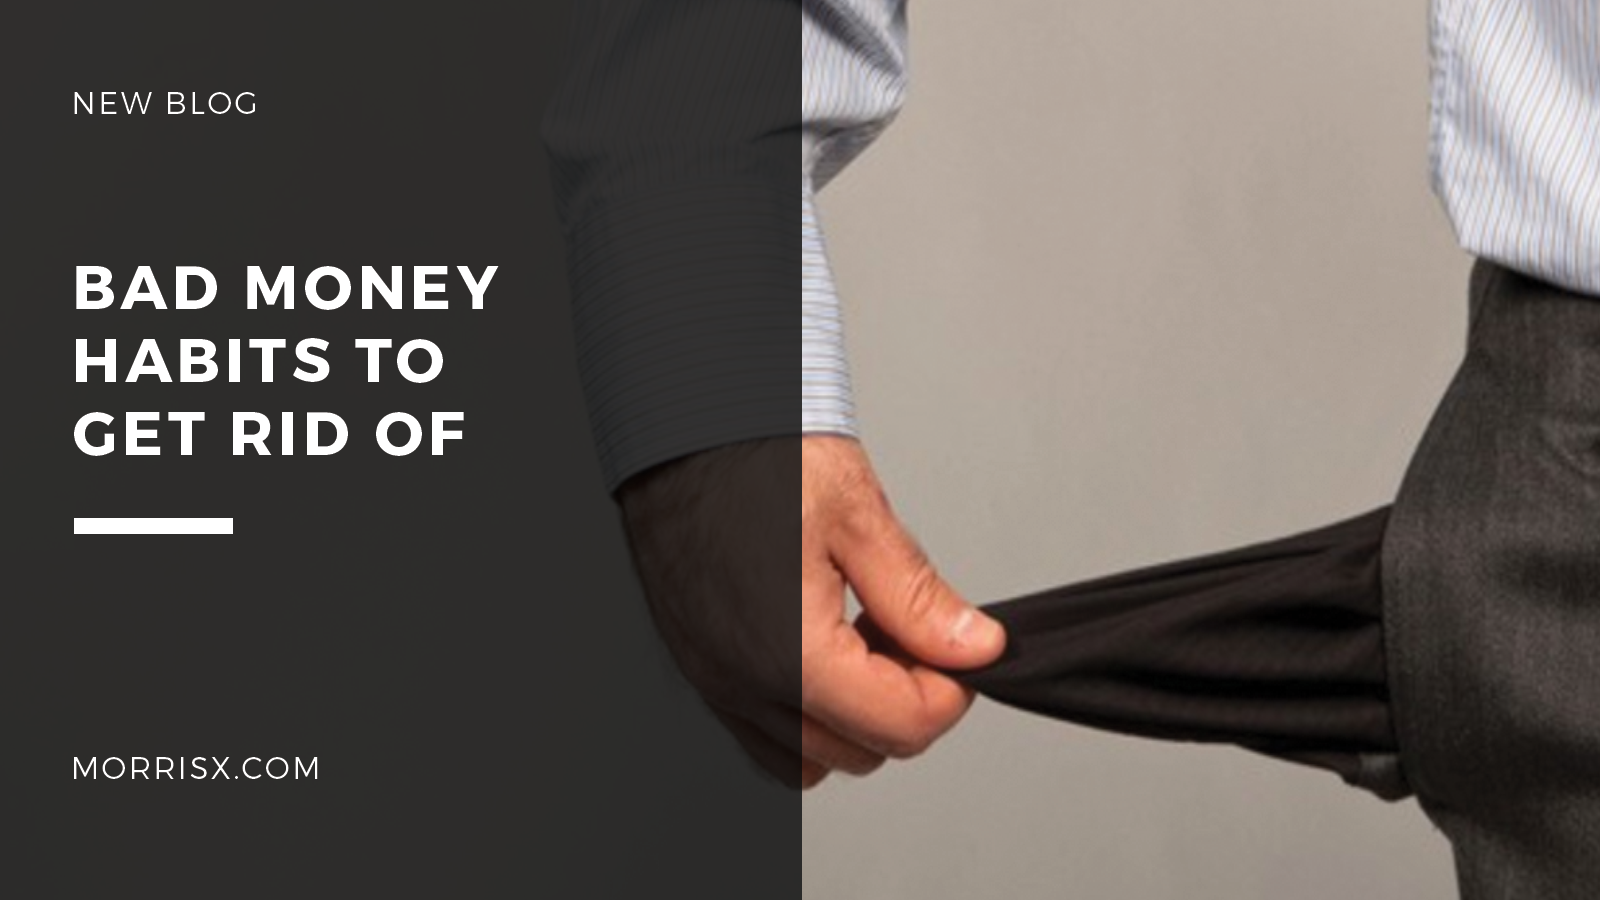 Bad money habits to get rid of